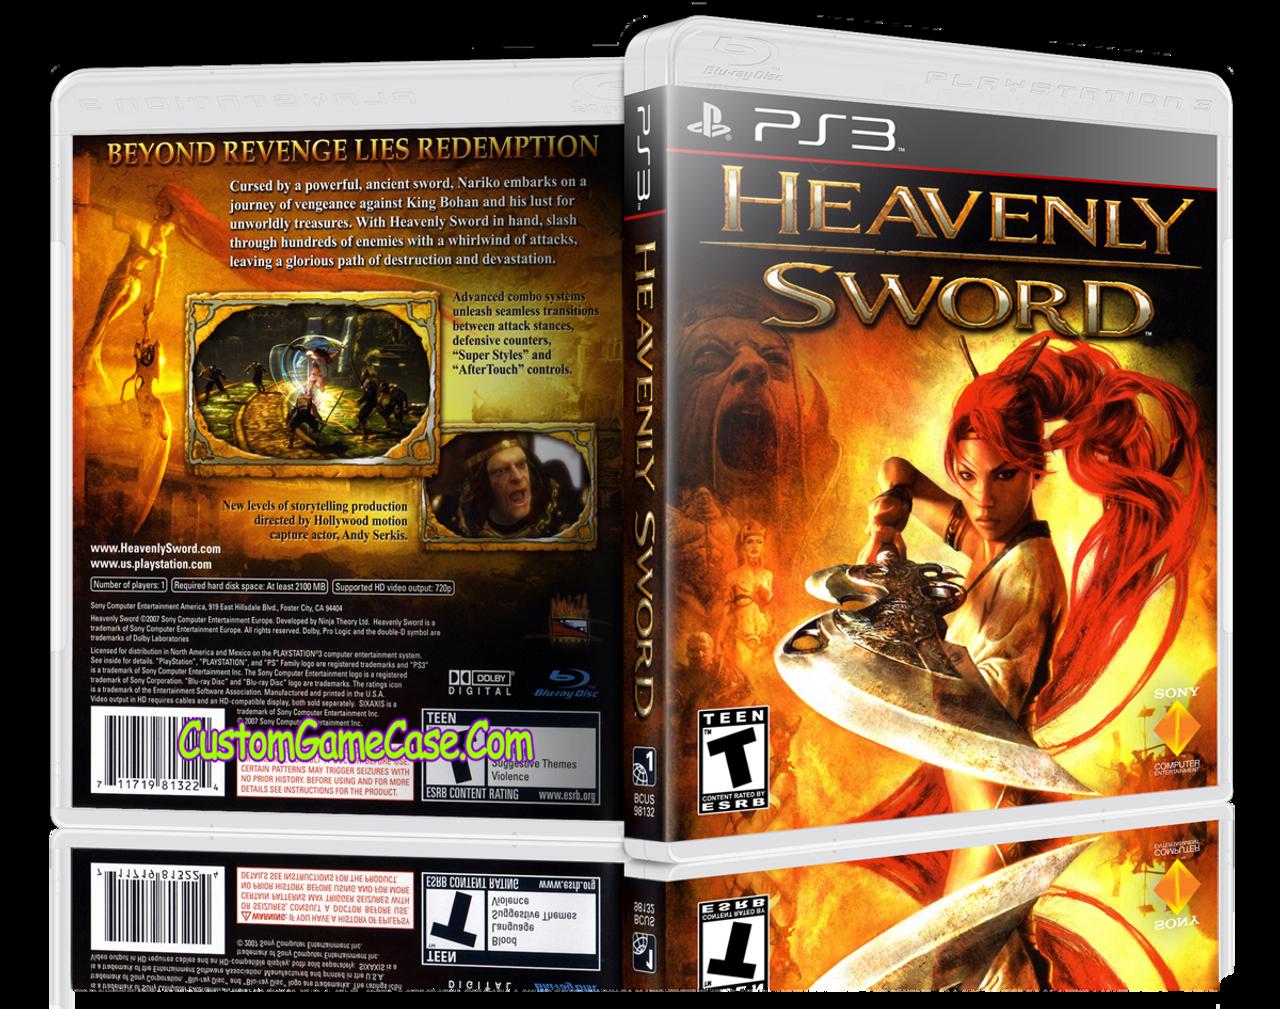 ps3 game heavenly sword